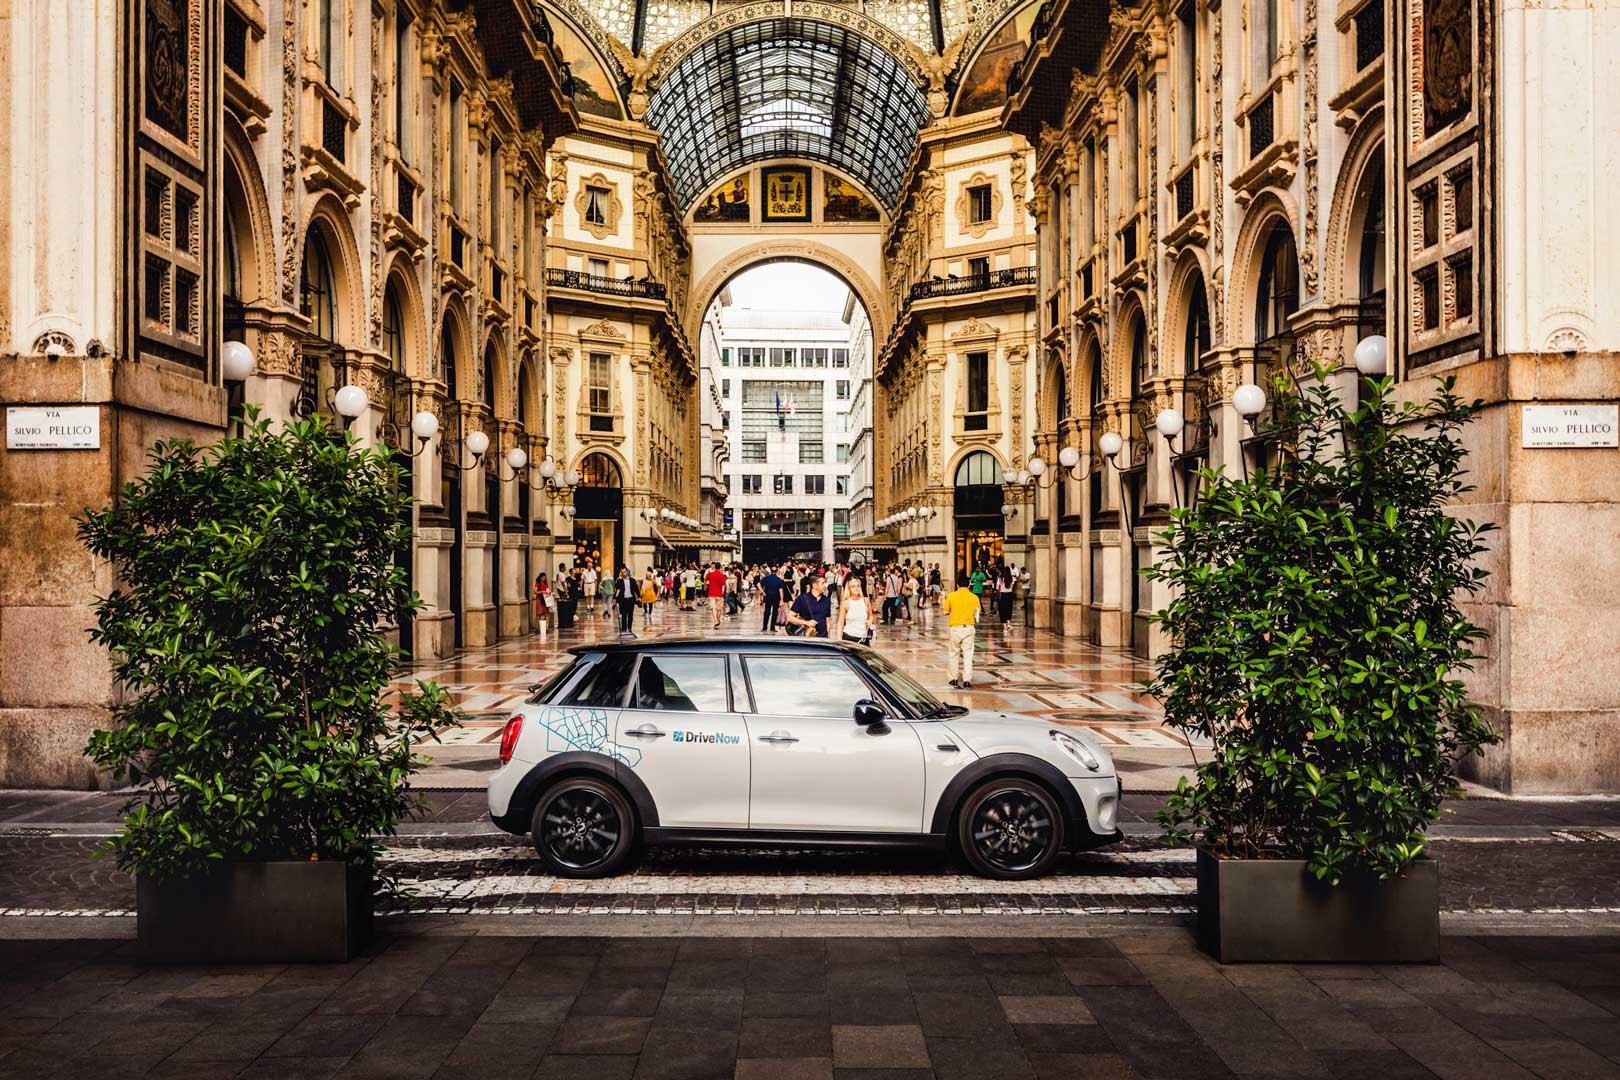 drivenow-car-sharing-milano-bmw-mini-galleria-vittorio-emanuele